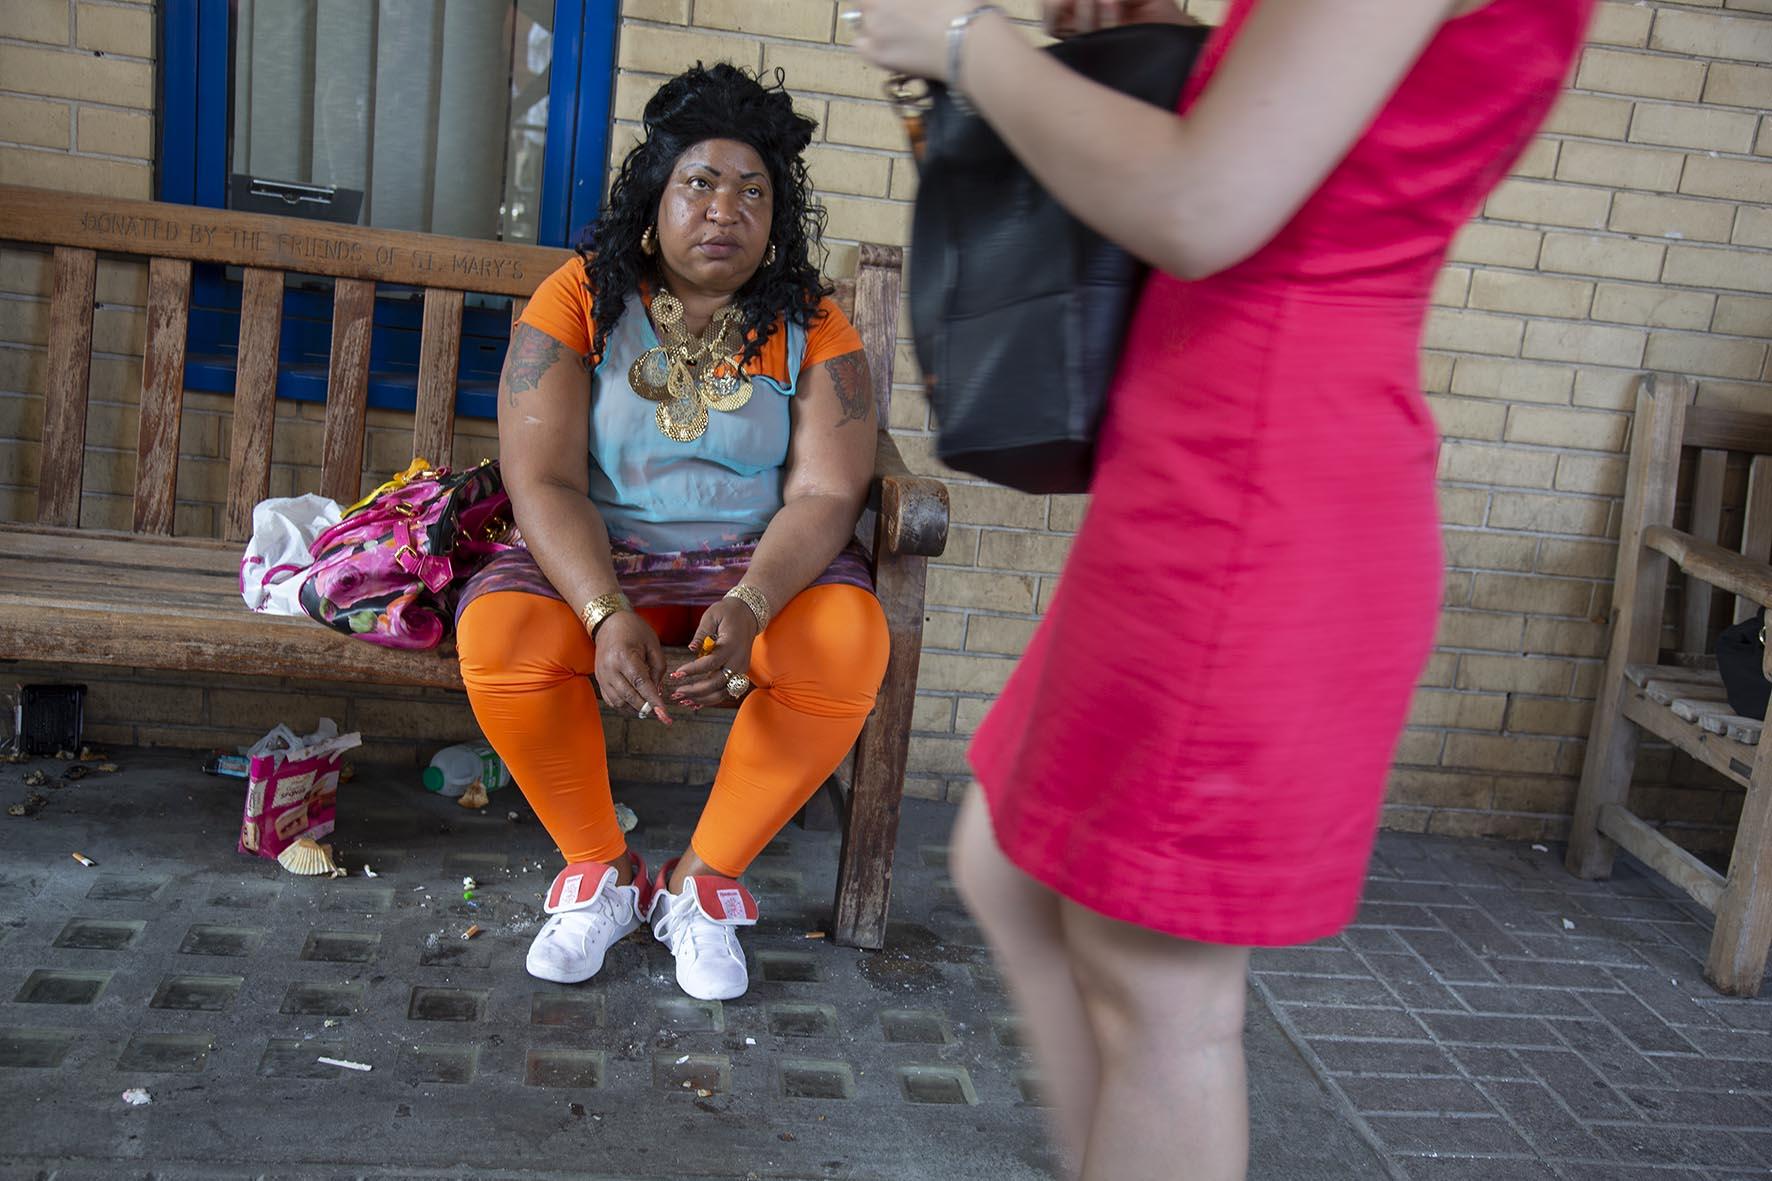 20130722_orange leggings woman_B.jpg